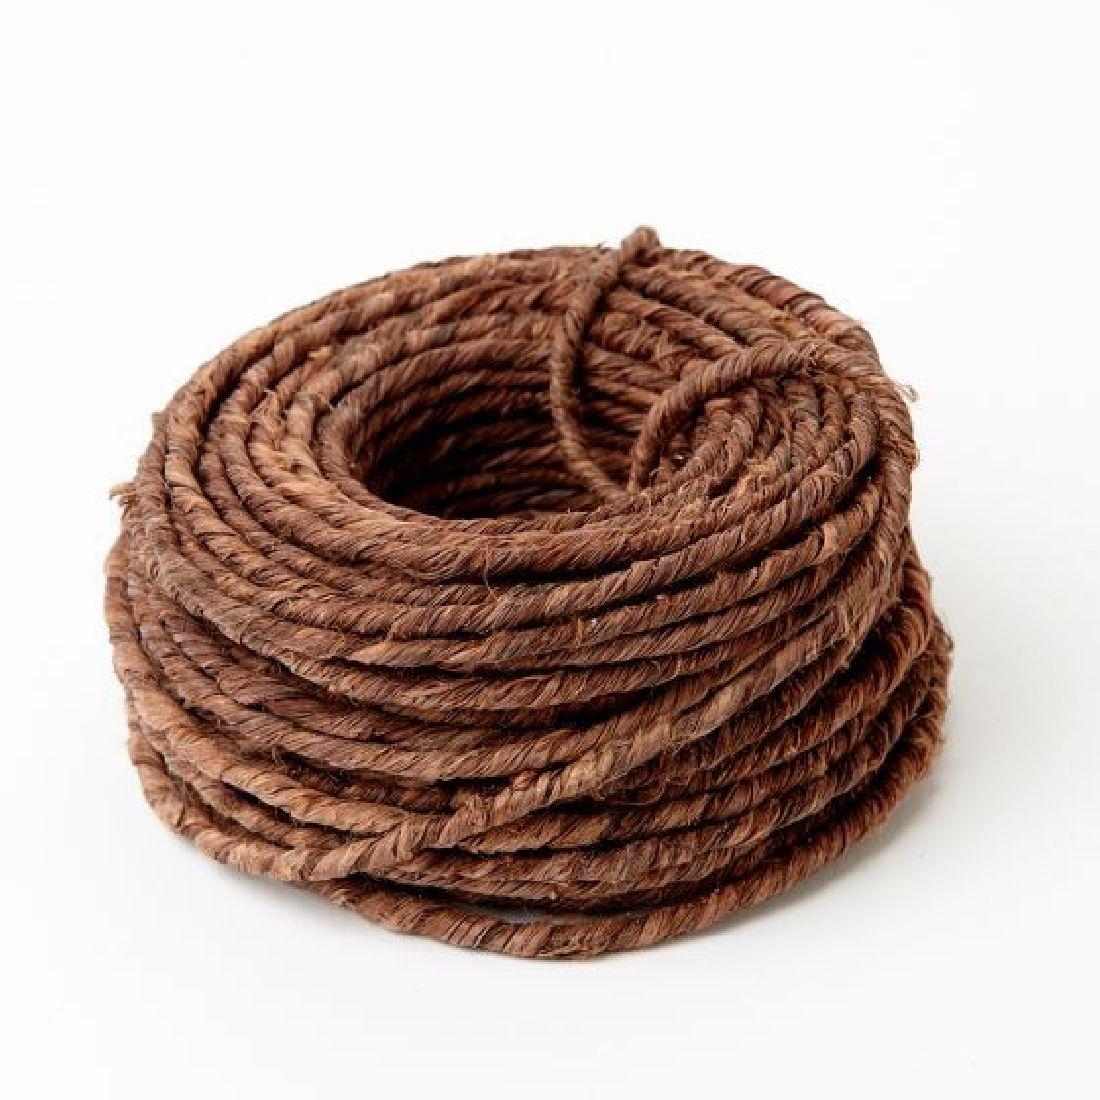 Oasis® Grapewine Wire BRAUN 40-77777 1,2 mm x 22 mtr.